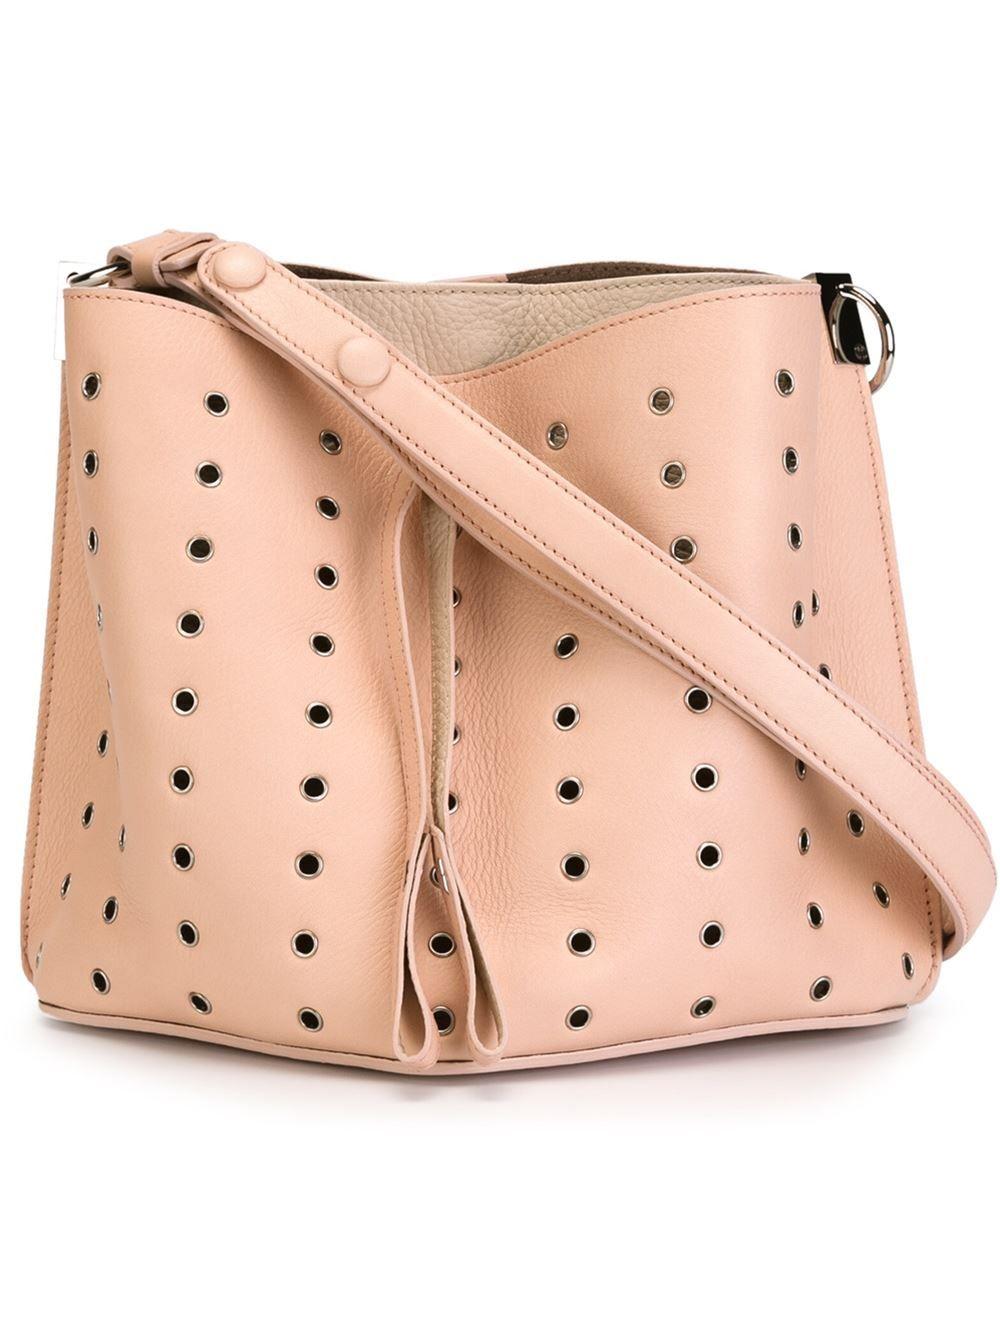 Maison Margiela сумка-мешок с люверсами